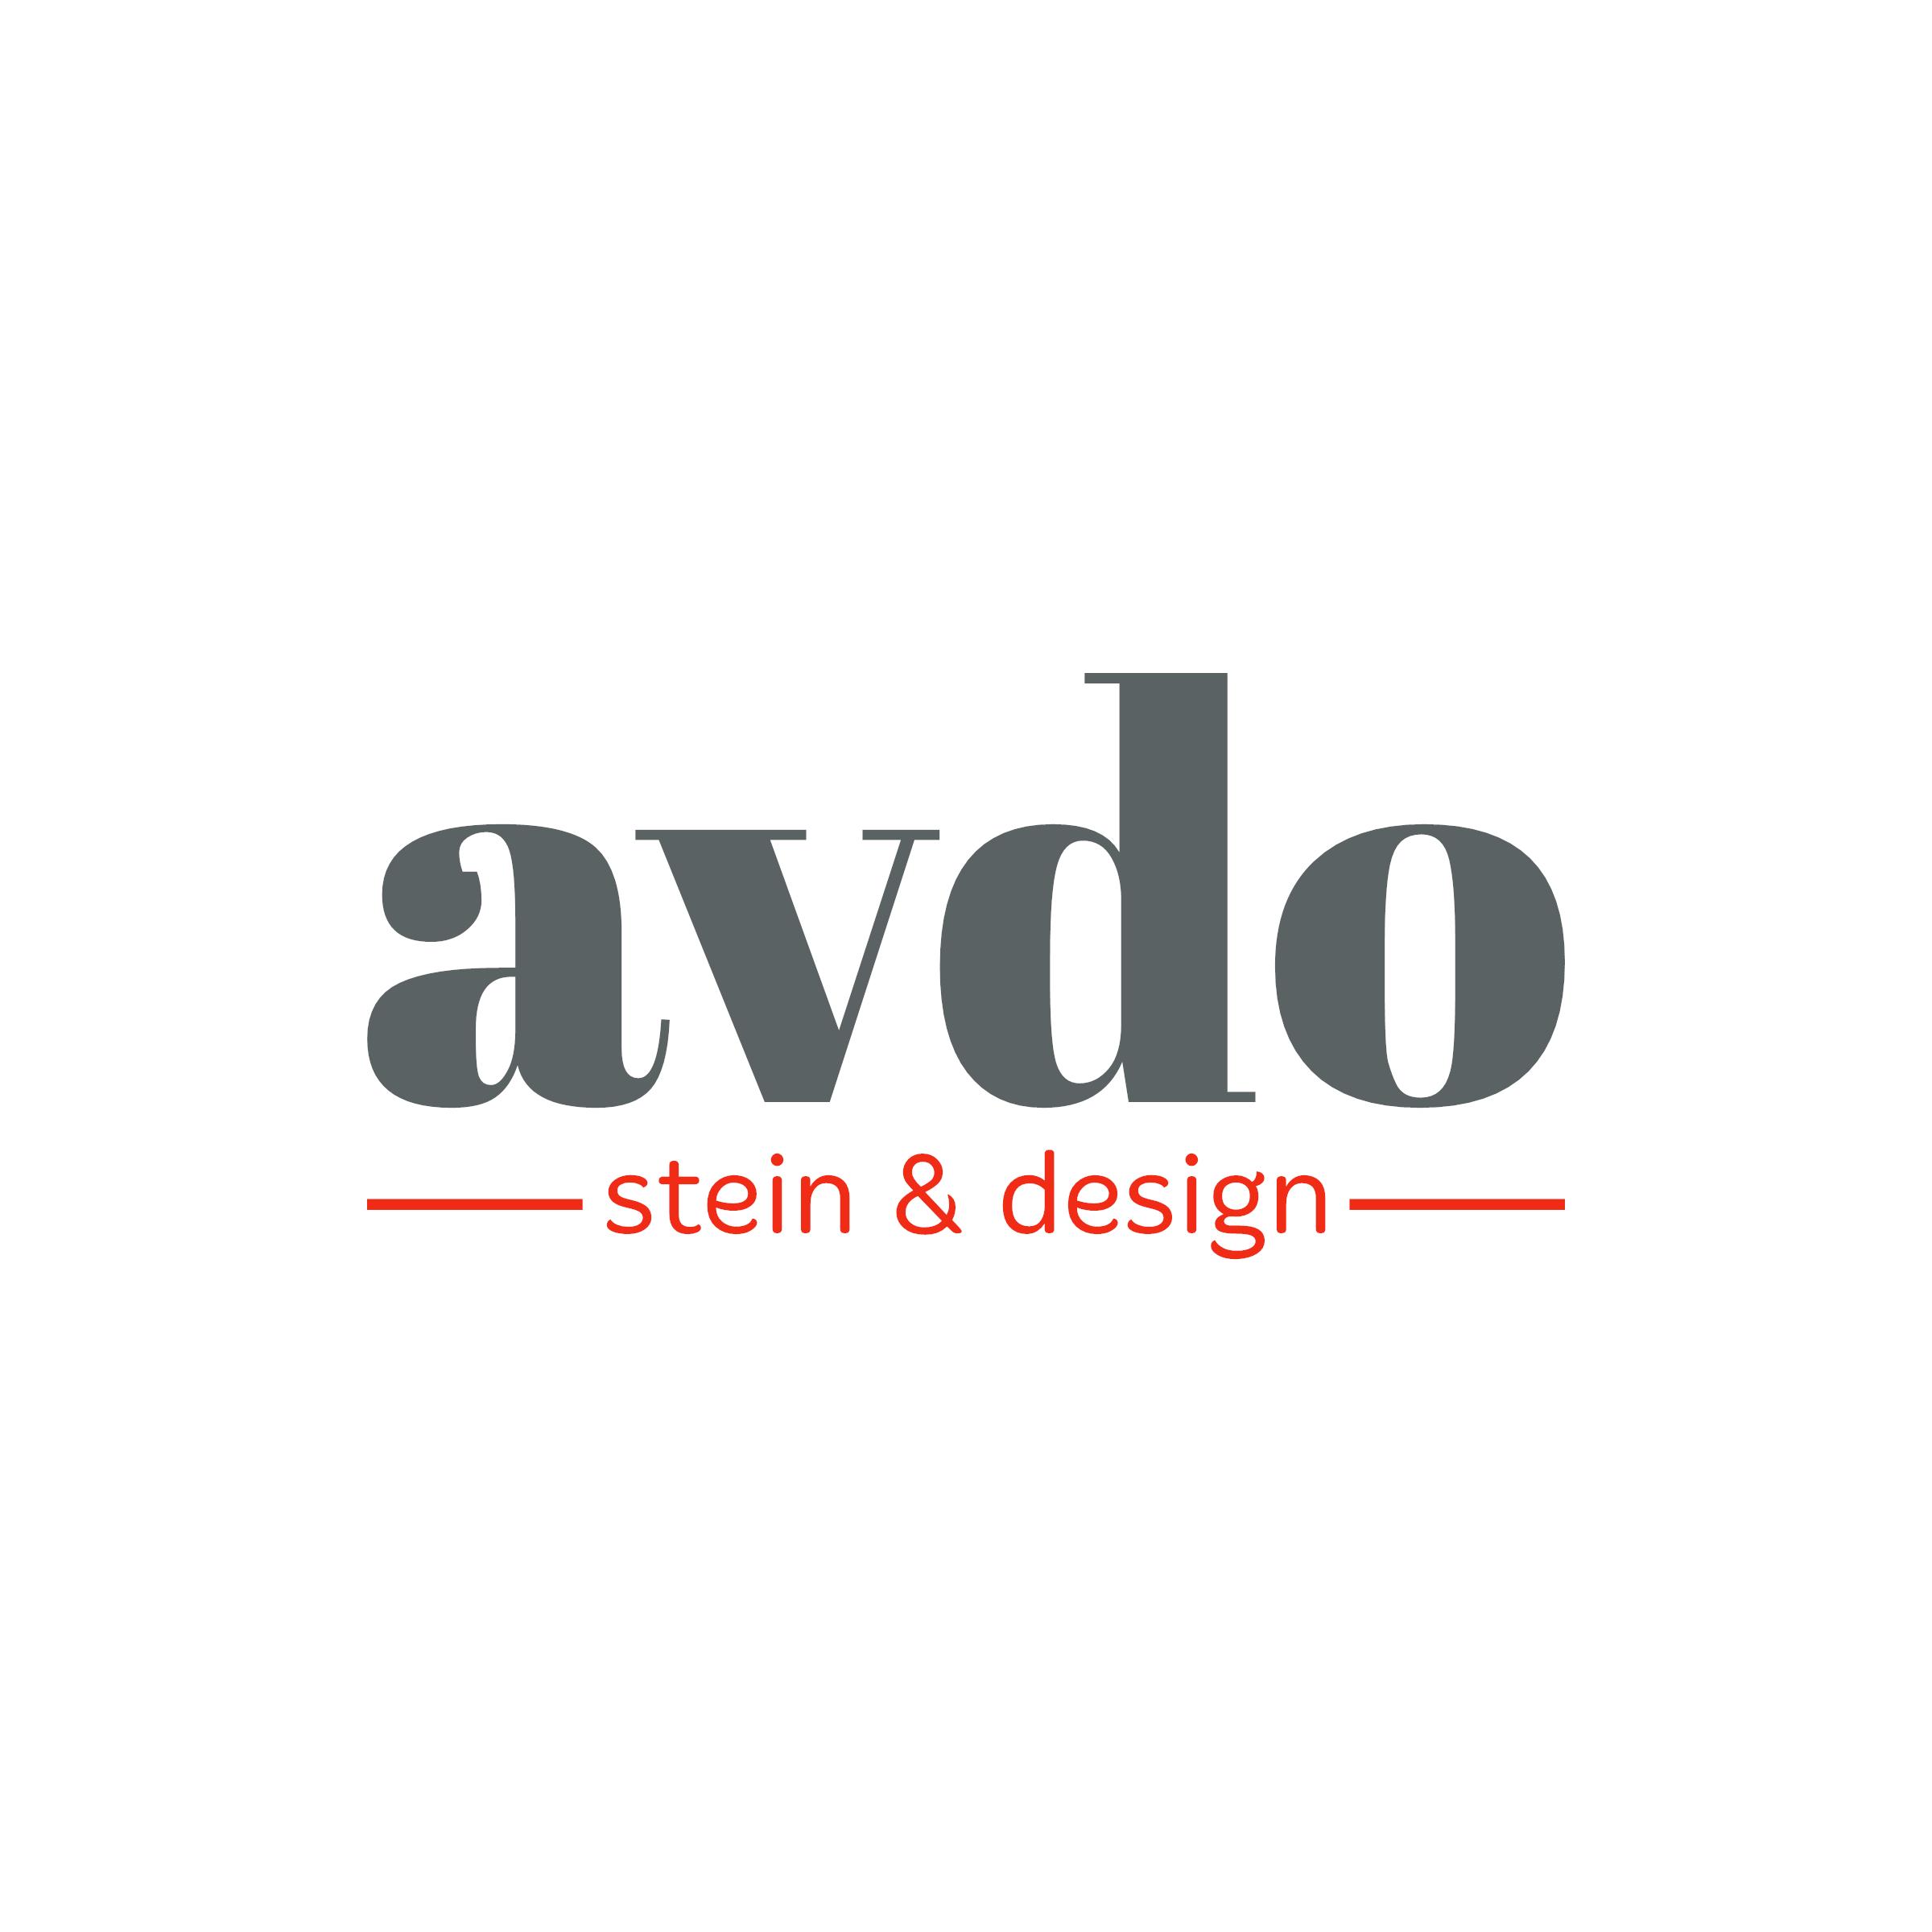 avdo design GmbH